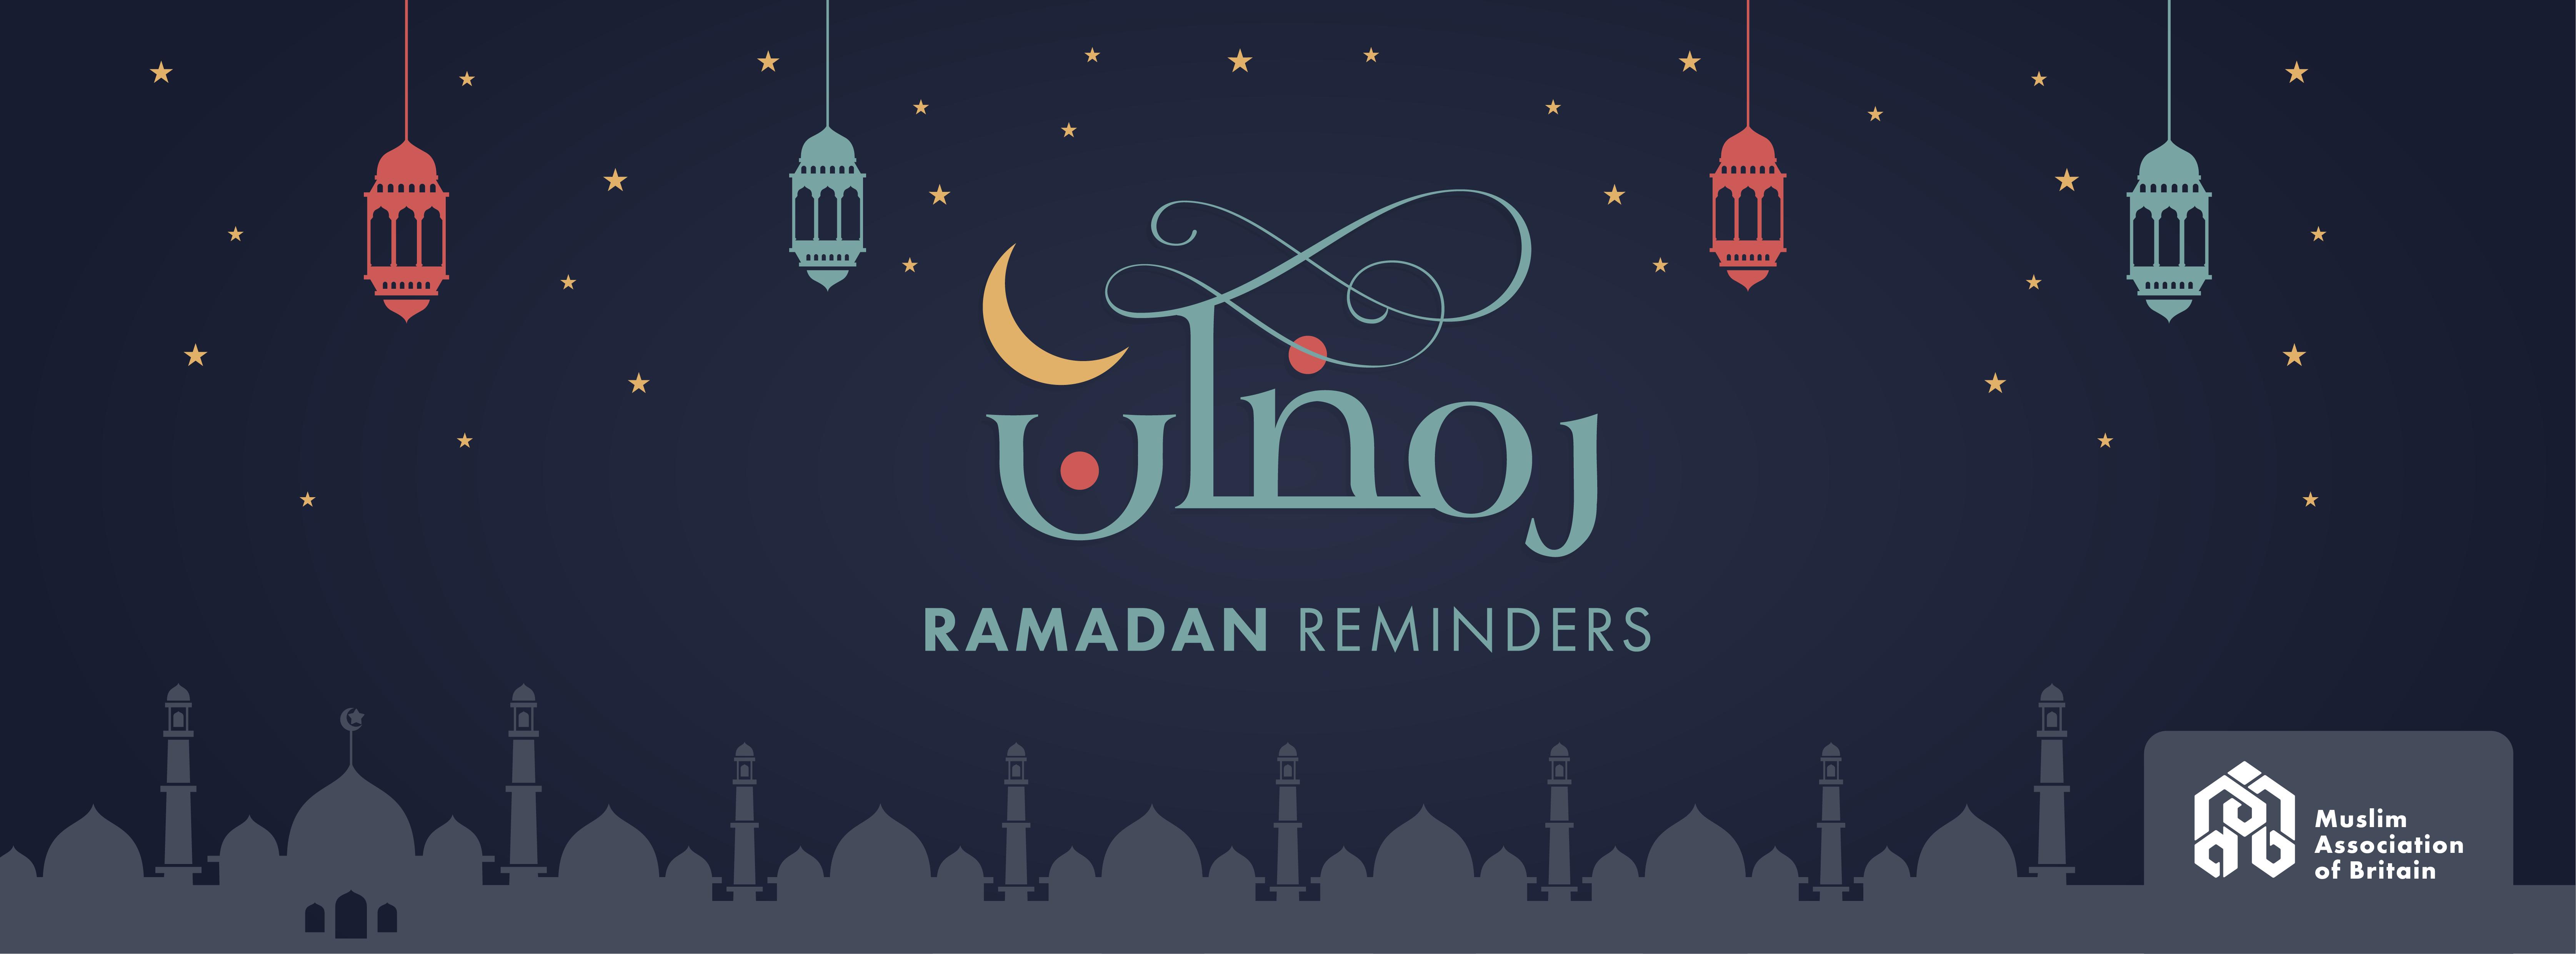 Ramadan Reminder 1 To The Fastinga Greeting Muslim Association